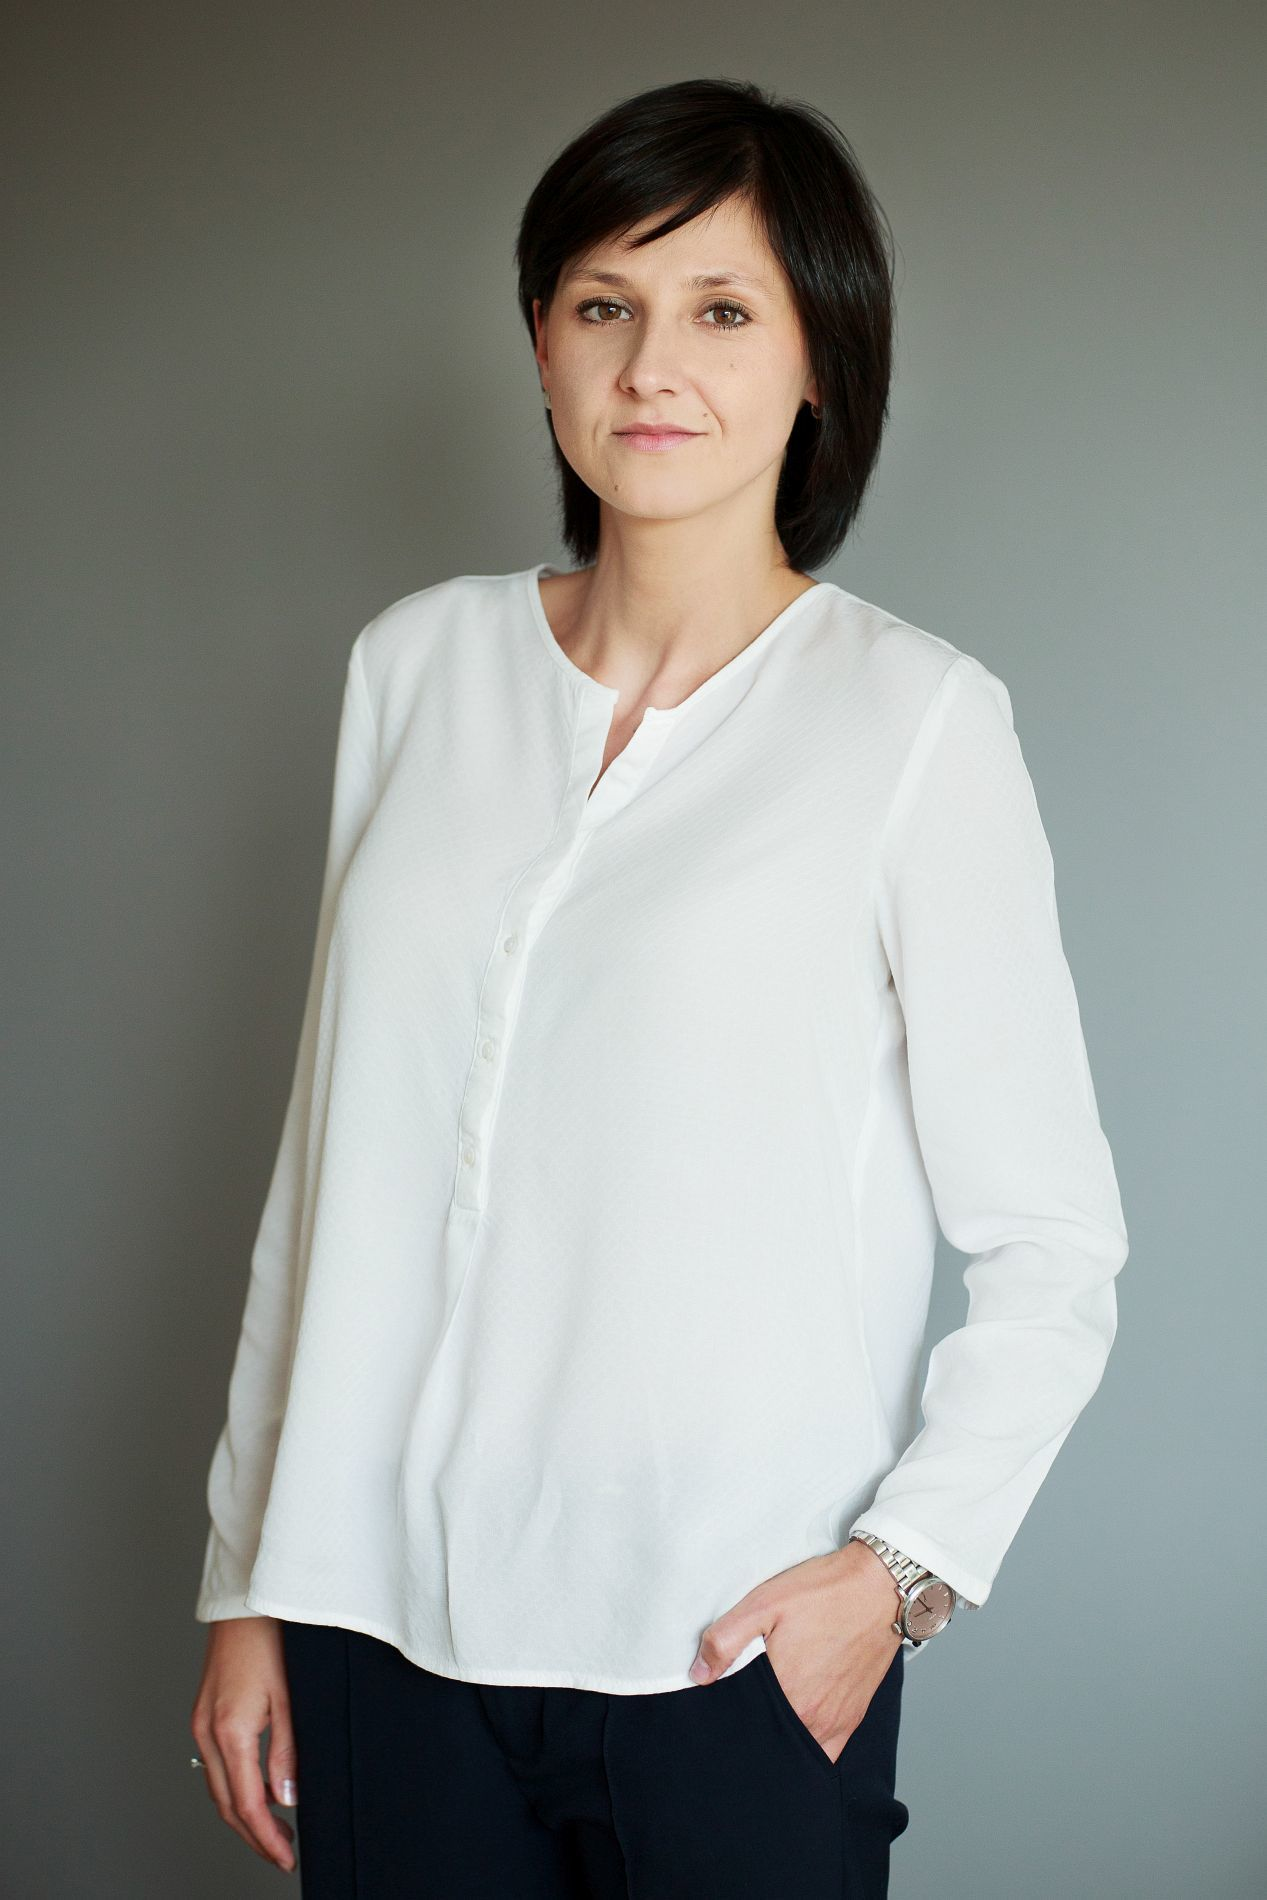 Aneta Jóźwik-Tkaczuk